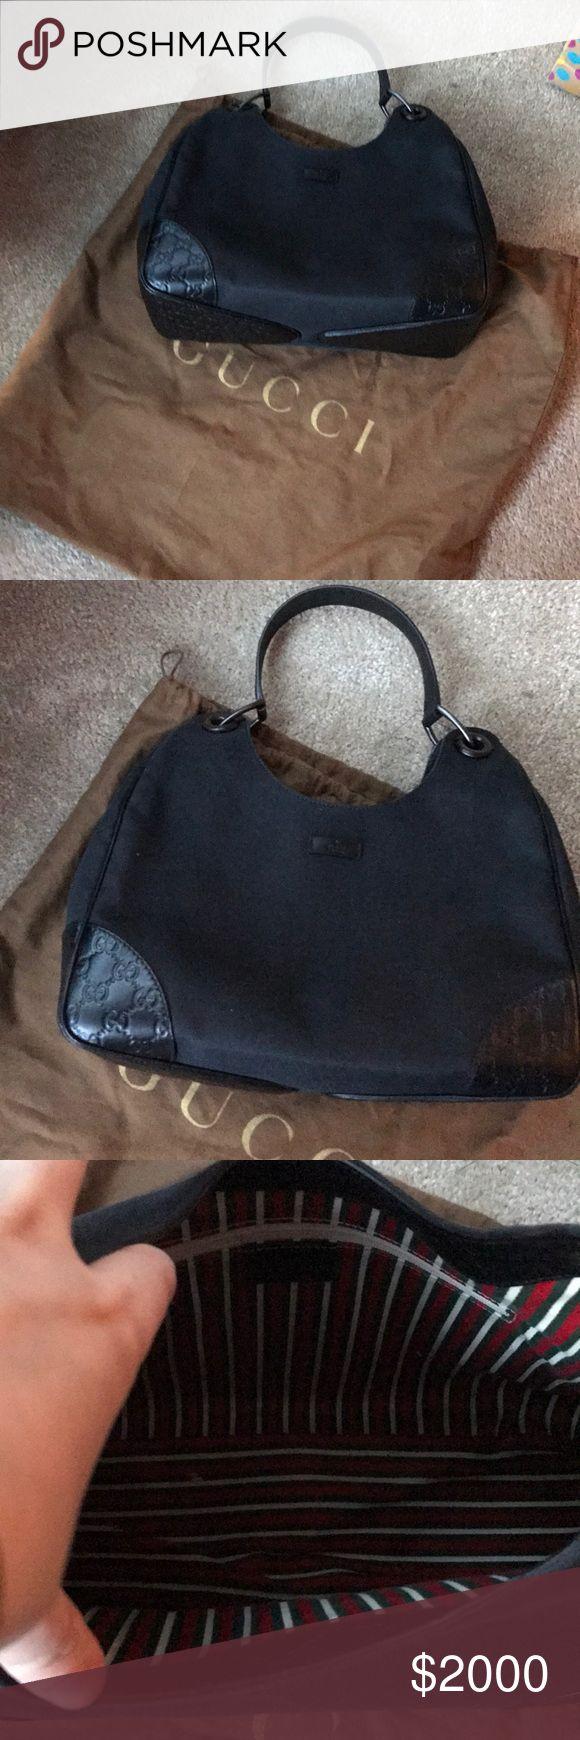 81cce57ec7b GUCCI Hobo handbag. Women s Bags .